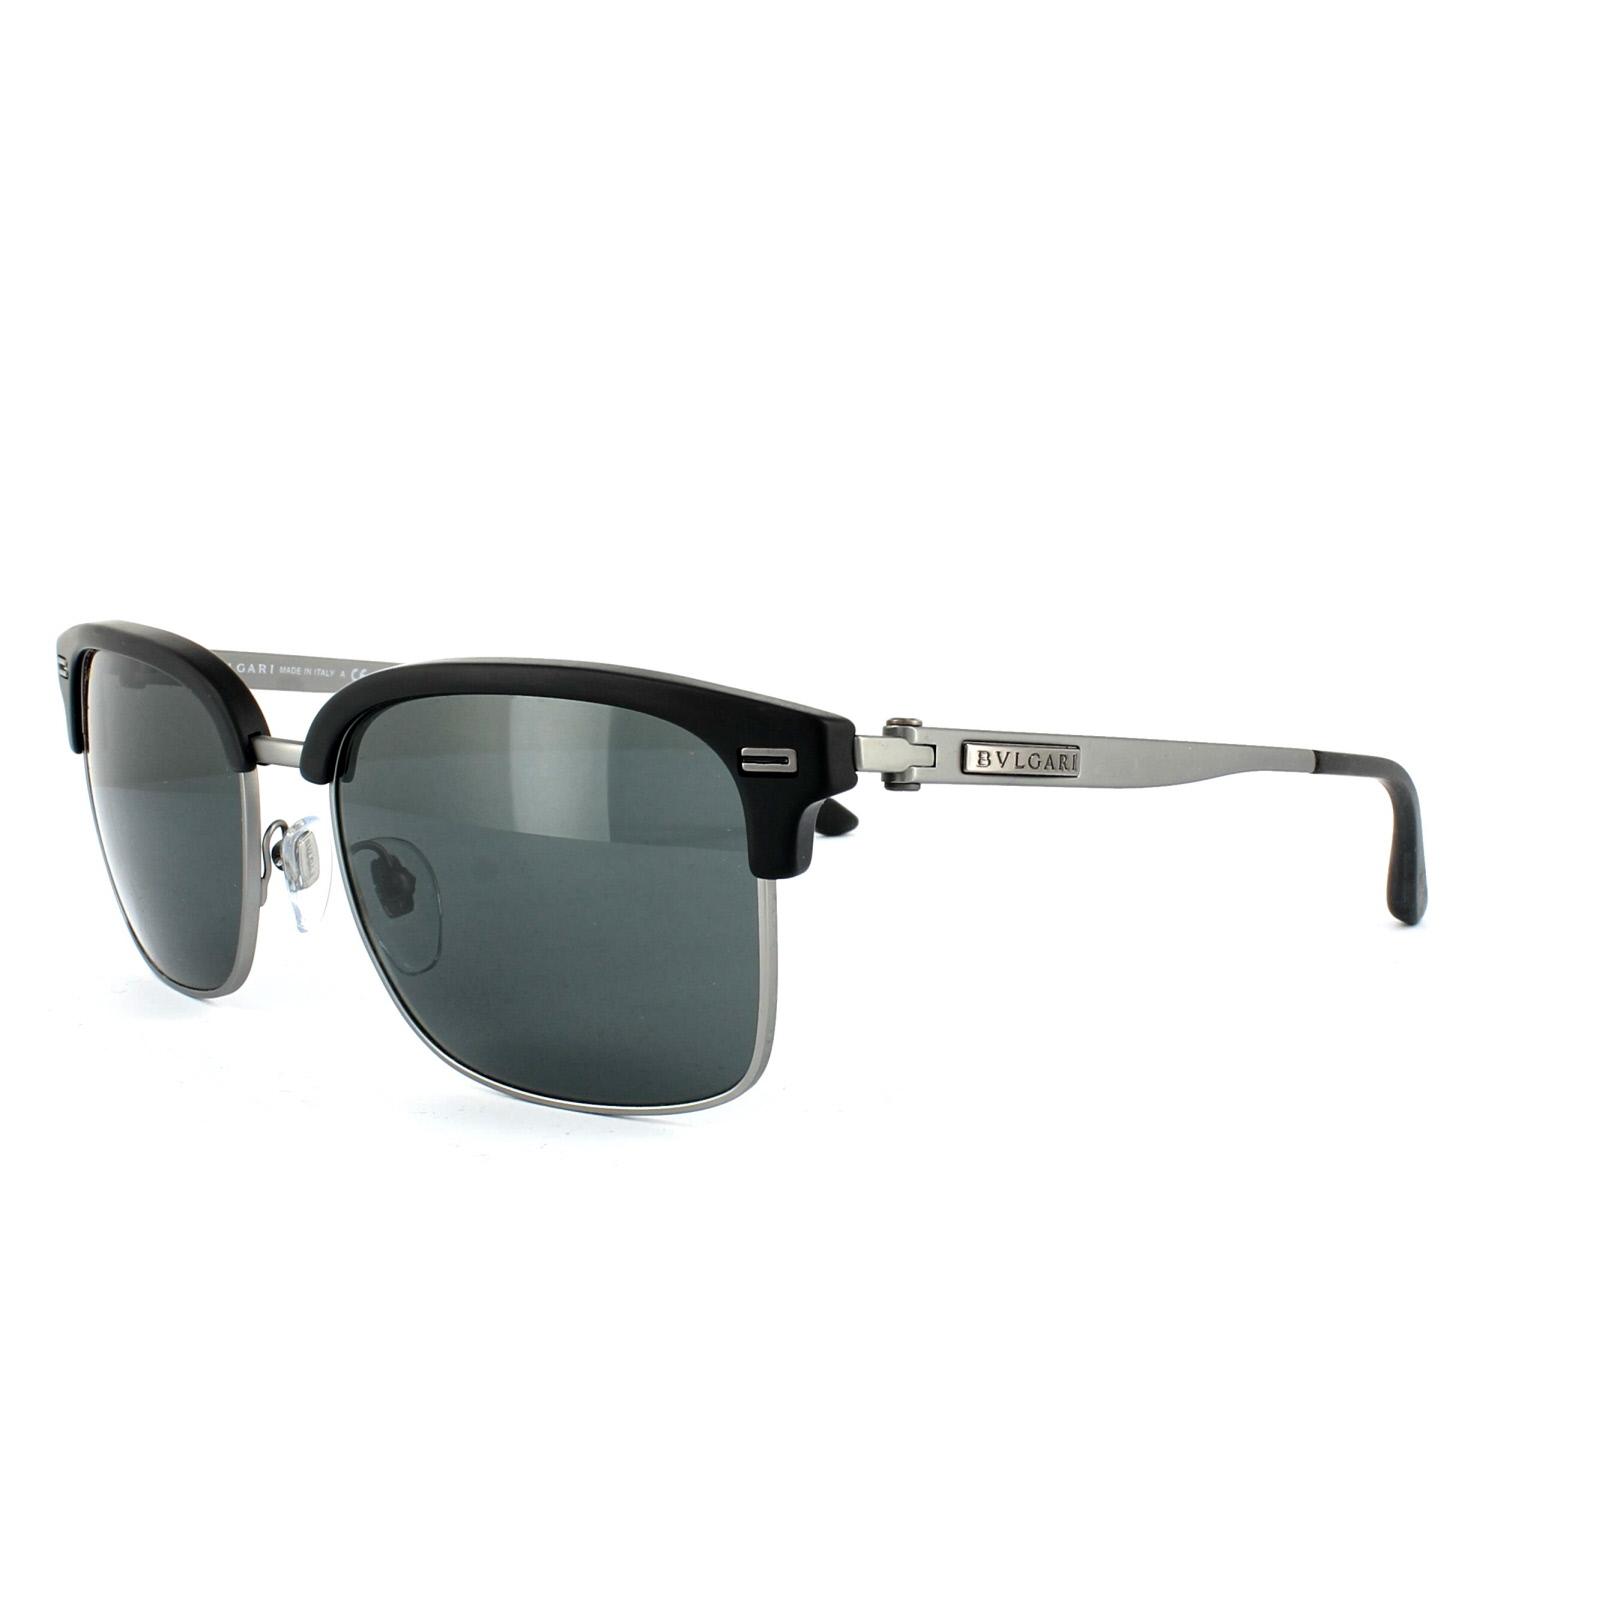 ffbb0b4914 Cheap Bvlgari 7026 Sunglasses - Discounted Sunglasses